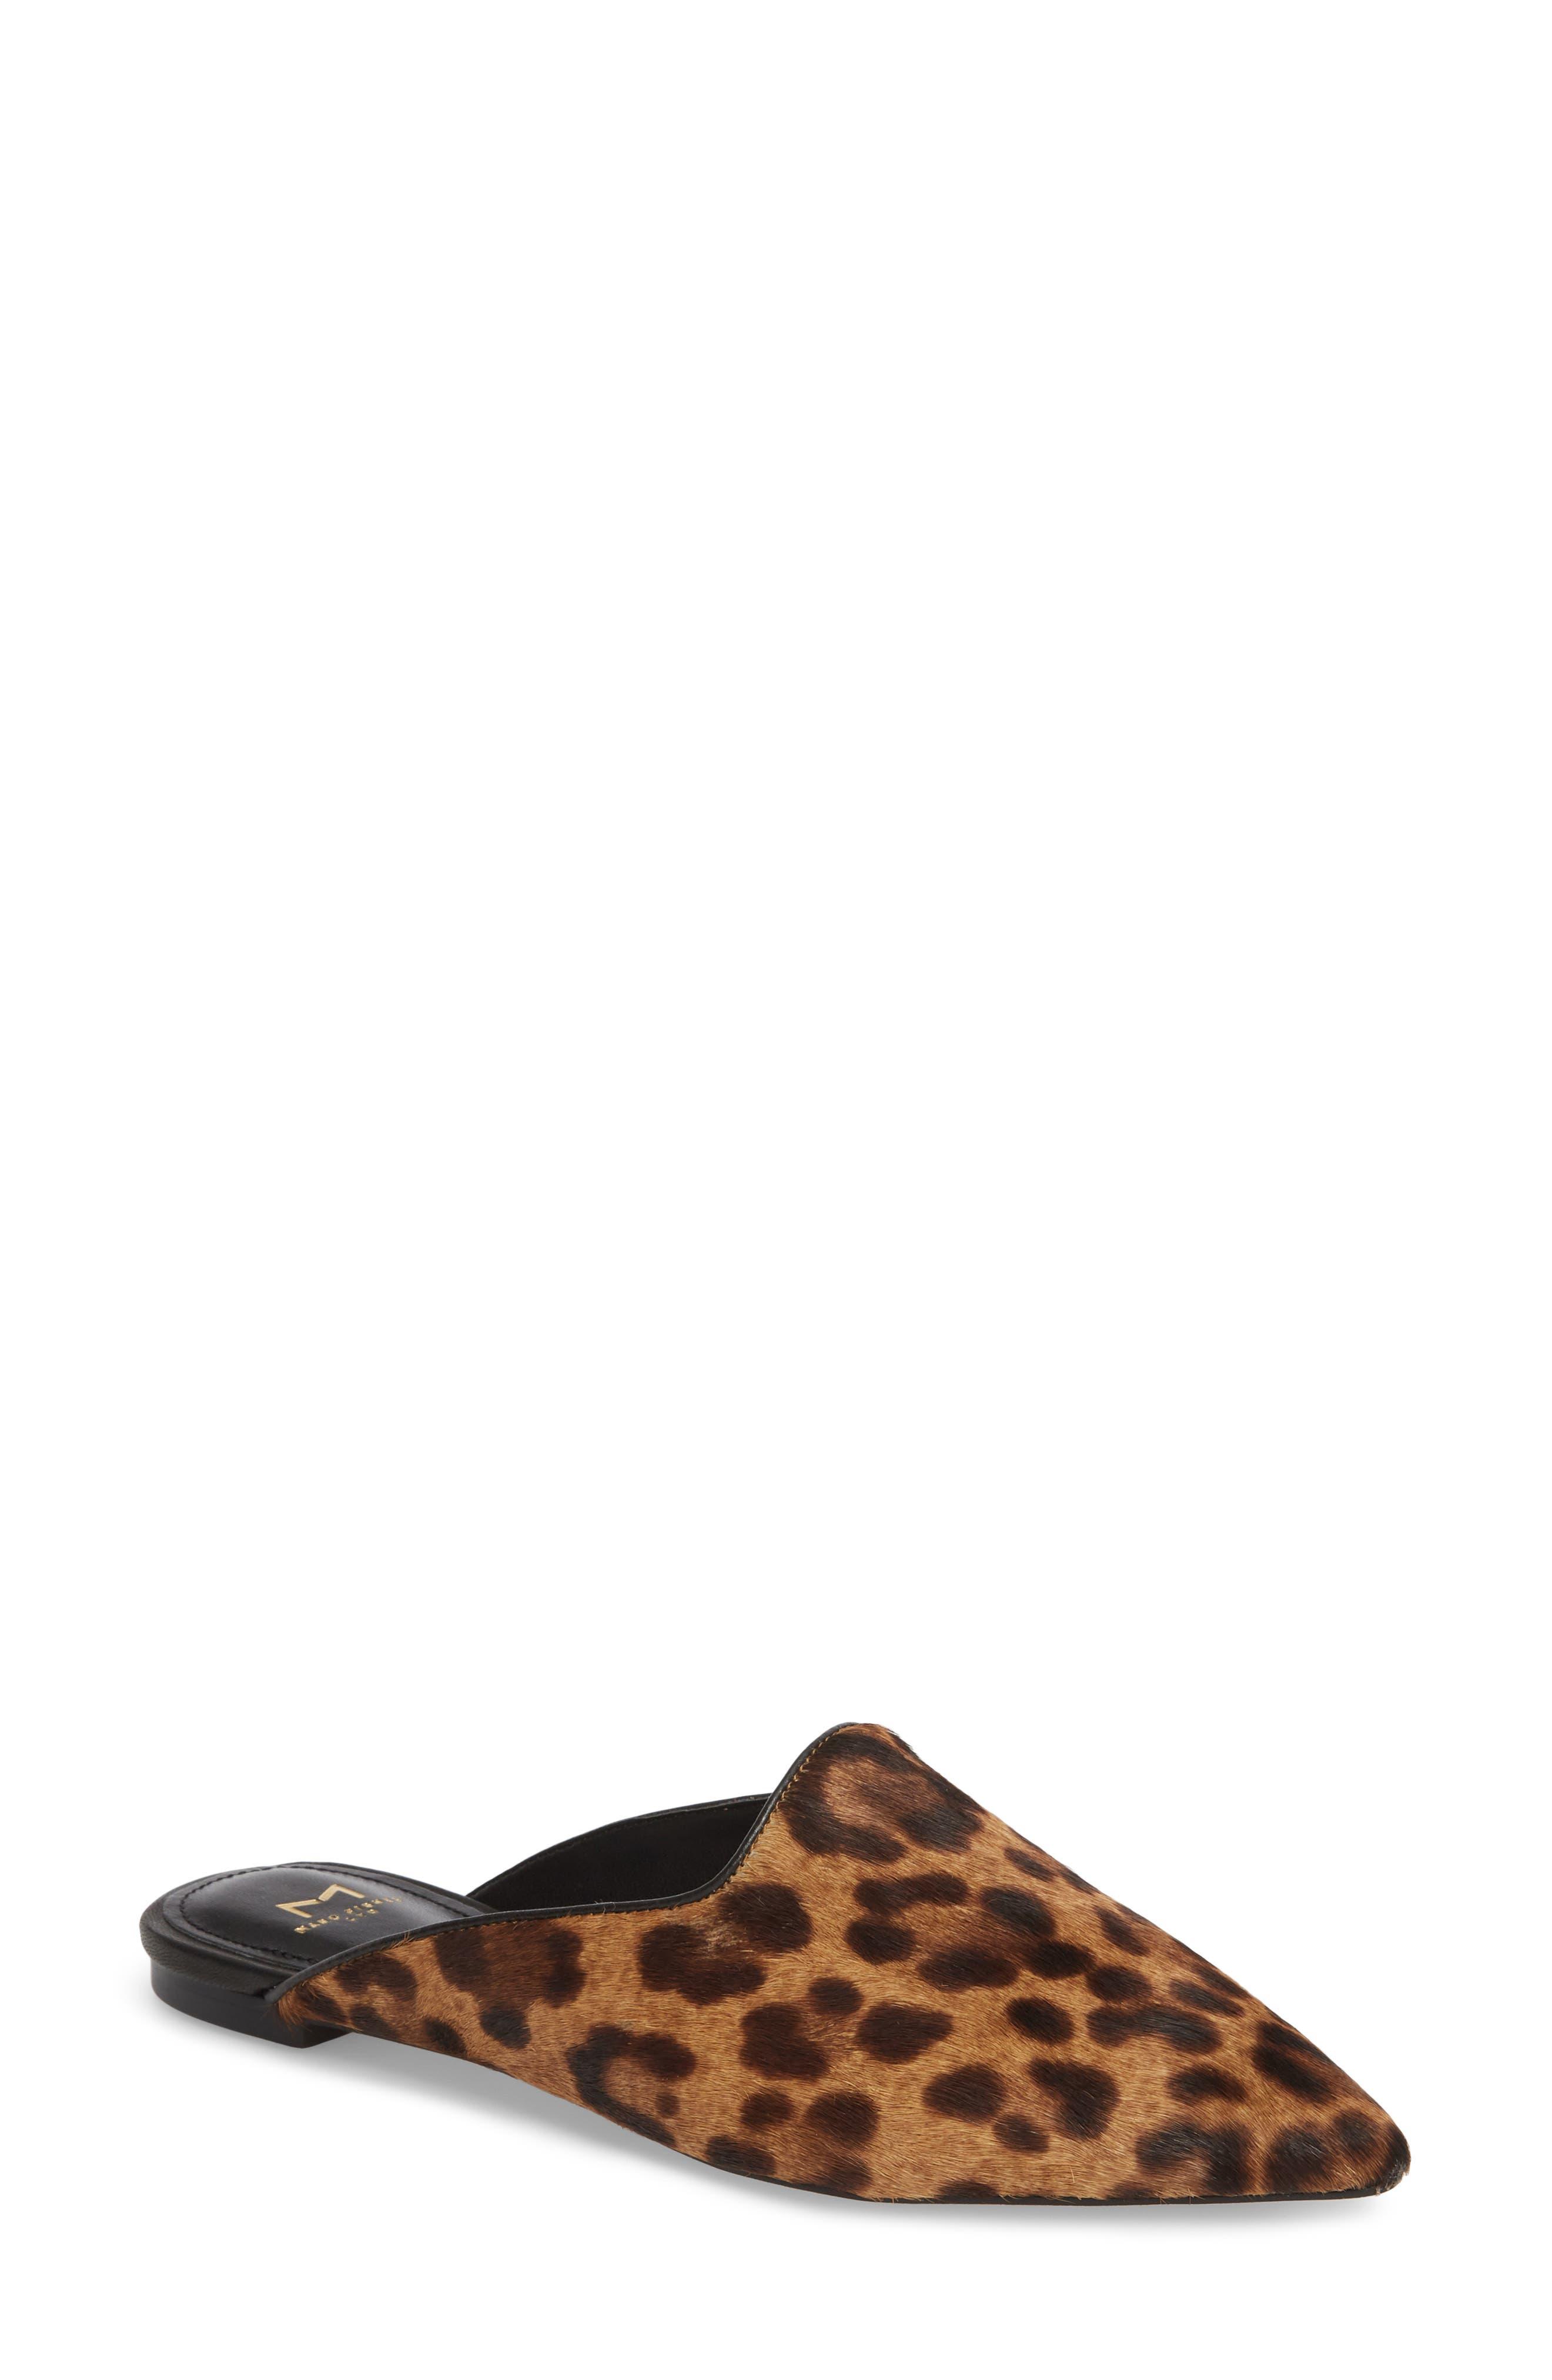 Sheenly Genuine Calf Hair Mule,                         Main,                         color, Leopard Hair Calf